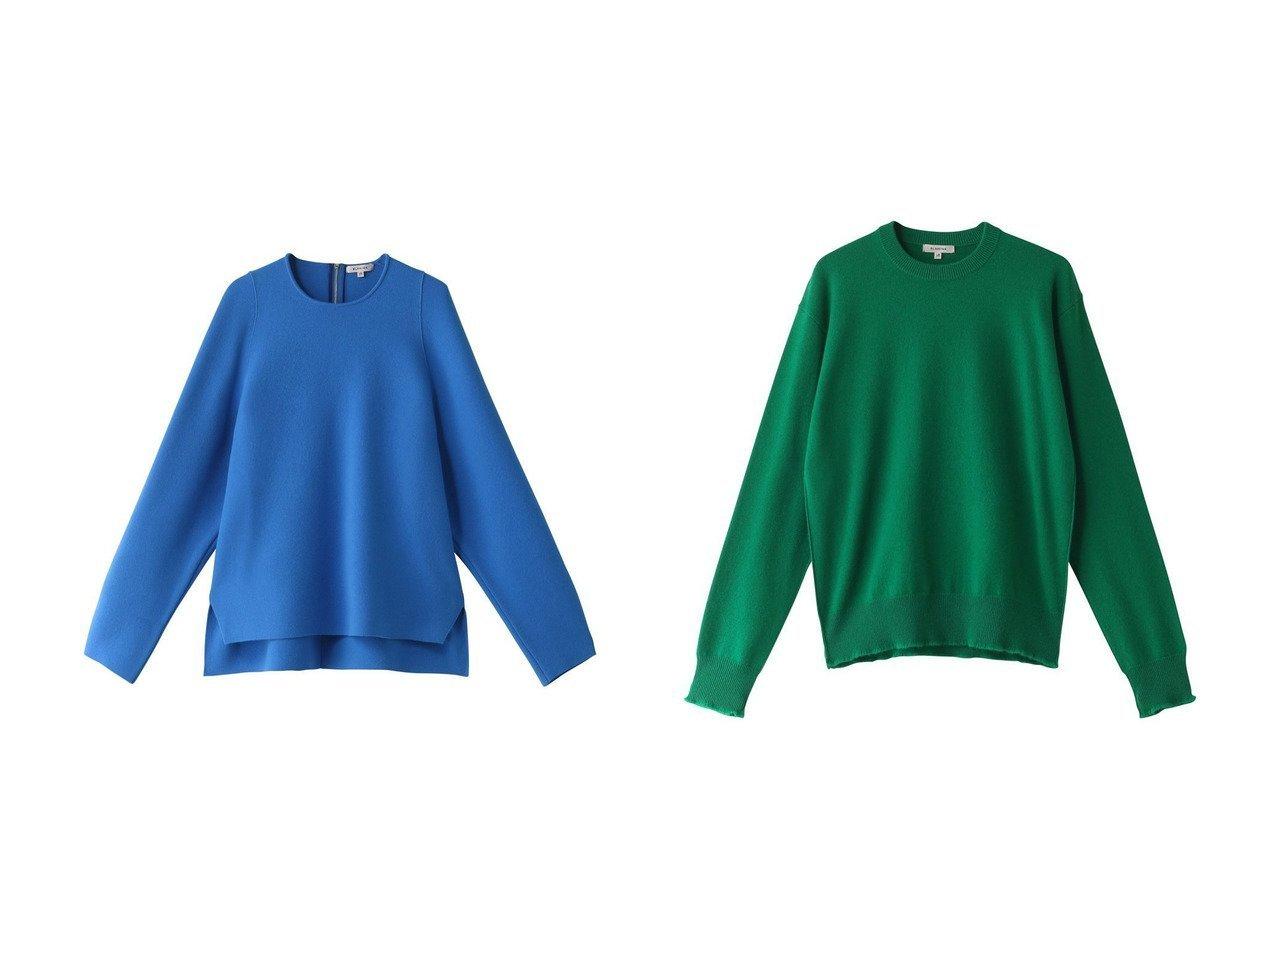 【BLAMINK/ブラミンク】のカシミヤ12GクルーネックロングスリーブW&ウールカシミヤ12Gクルーロングスリーブ トップス・カットソーのおすすめ!人気、レディースファッションの通販 おすすめで人気のファッション通販商品 インテリア・家具・キッズファッション・メンズファッション・レディースファッション・服の通販 founy(ファニー) https://founy.com/ ファッション Fashion レディース WOMEN トップス Tops Tshirt ニット Knit Tops プルオーバー Pullover カシミヤ シンプル バランス フォルム ボトム |ID:crp329100000001909